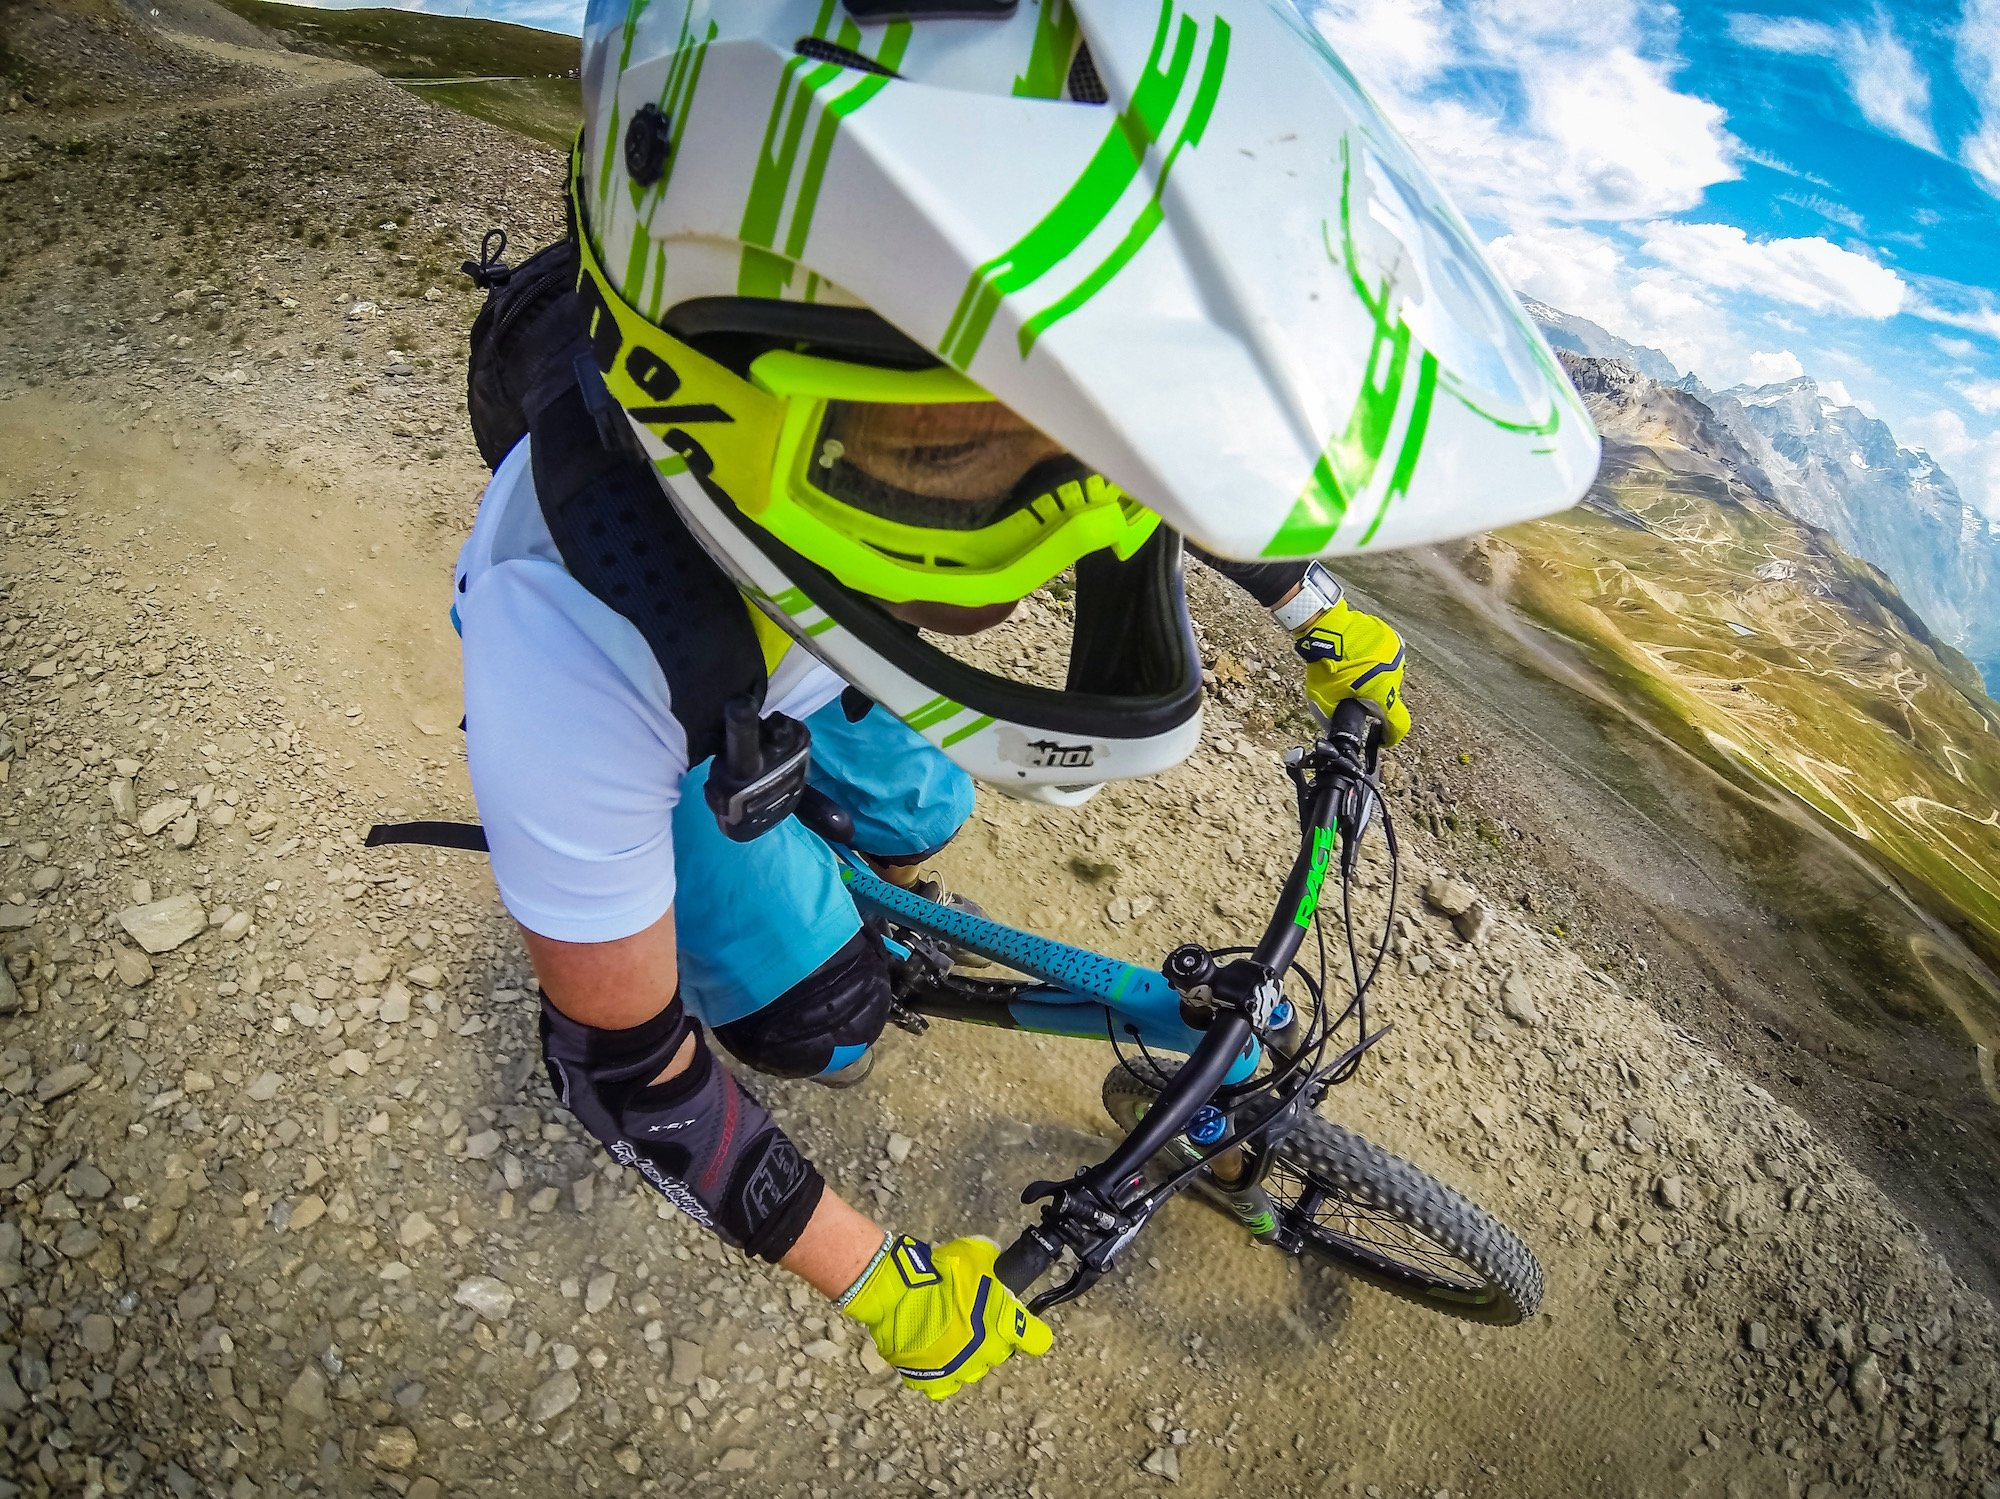 Fiona-Madden-Mountain-biking-gopro-france